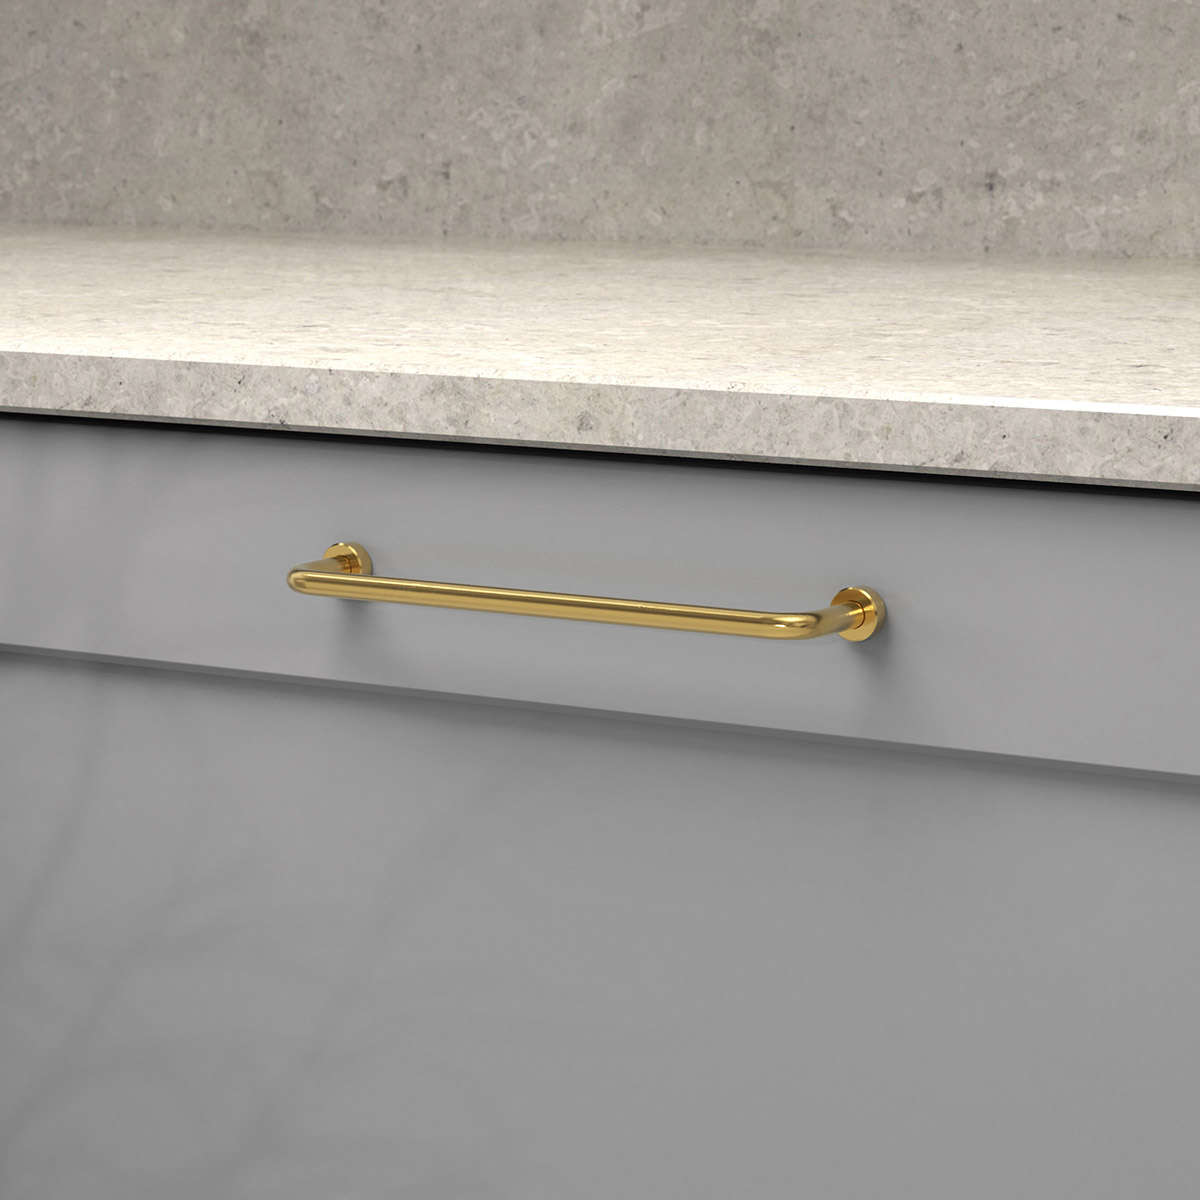 Handtag lounge polerad massing 370121 11 cc 160 mm ncs s 4500 n kalksten